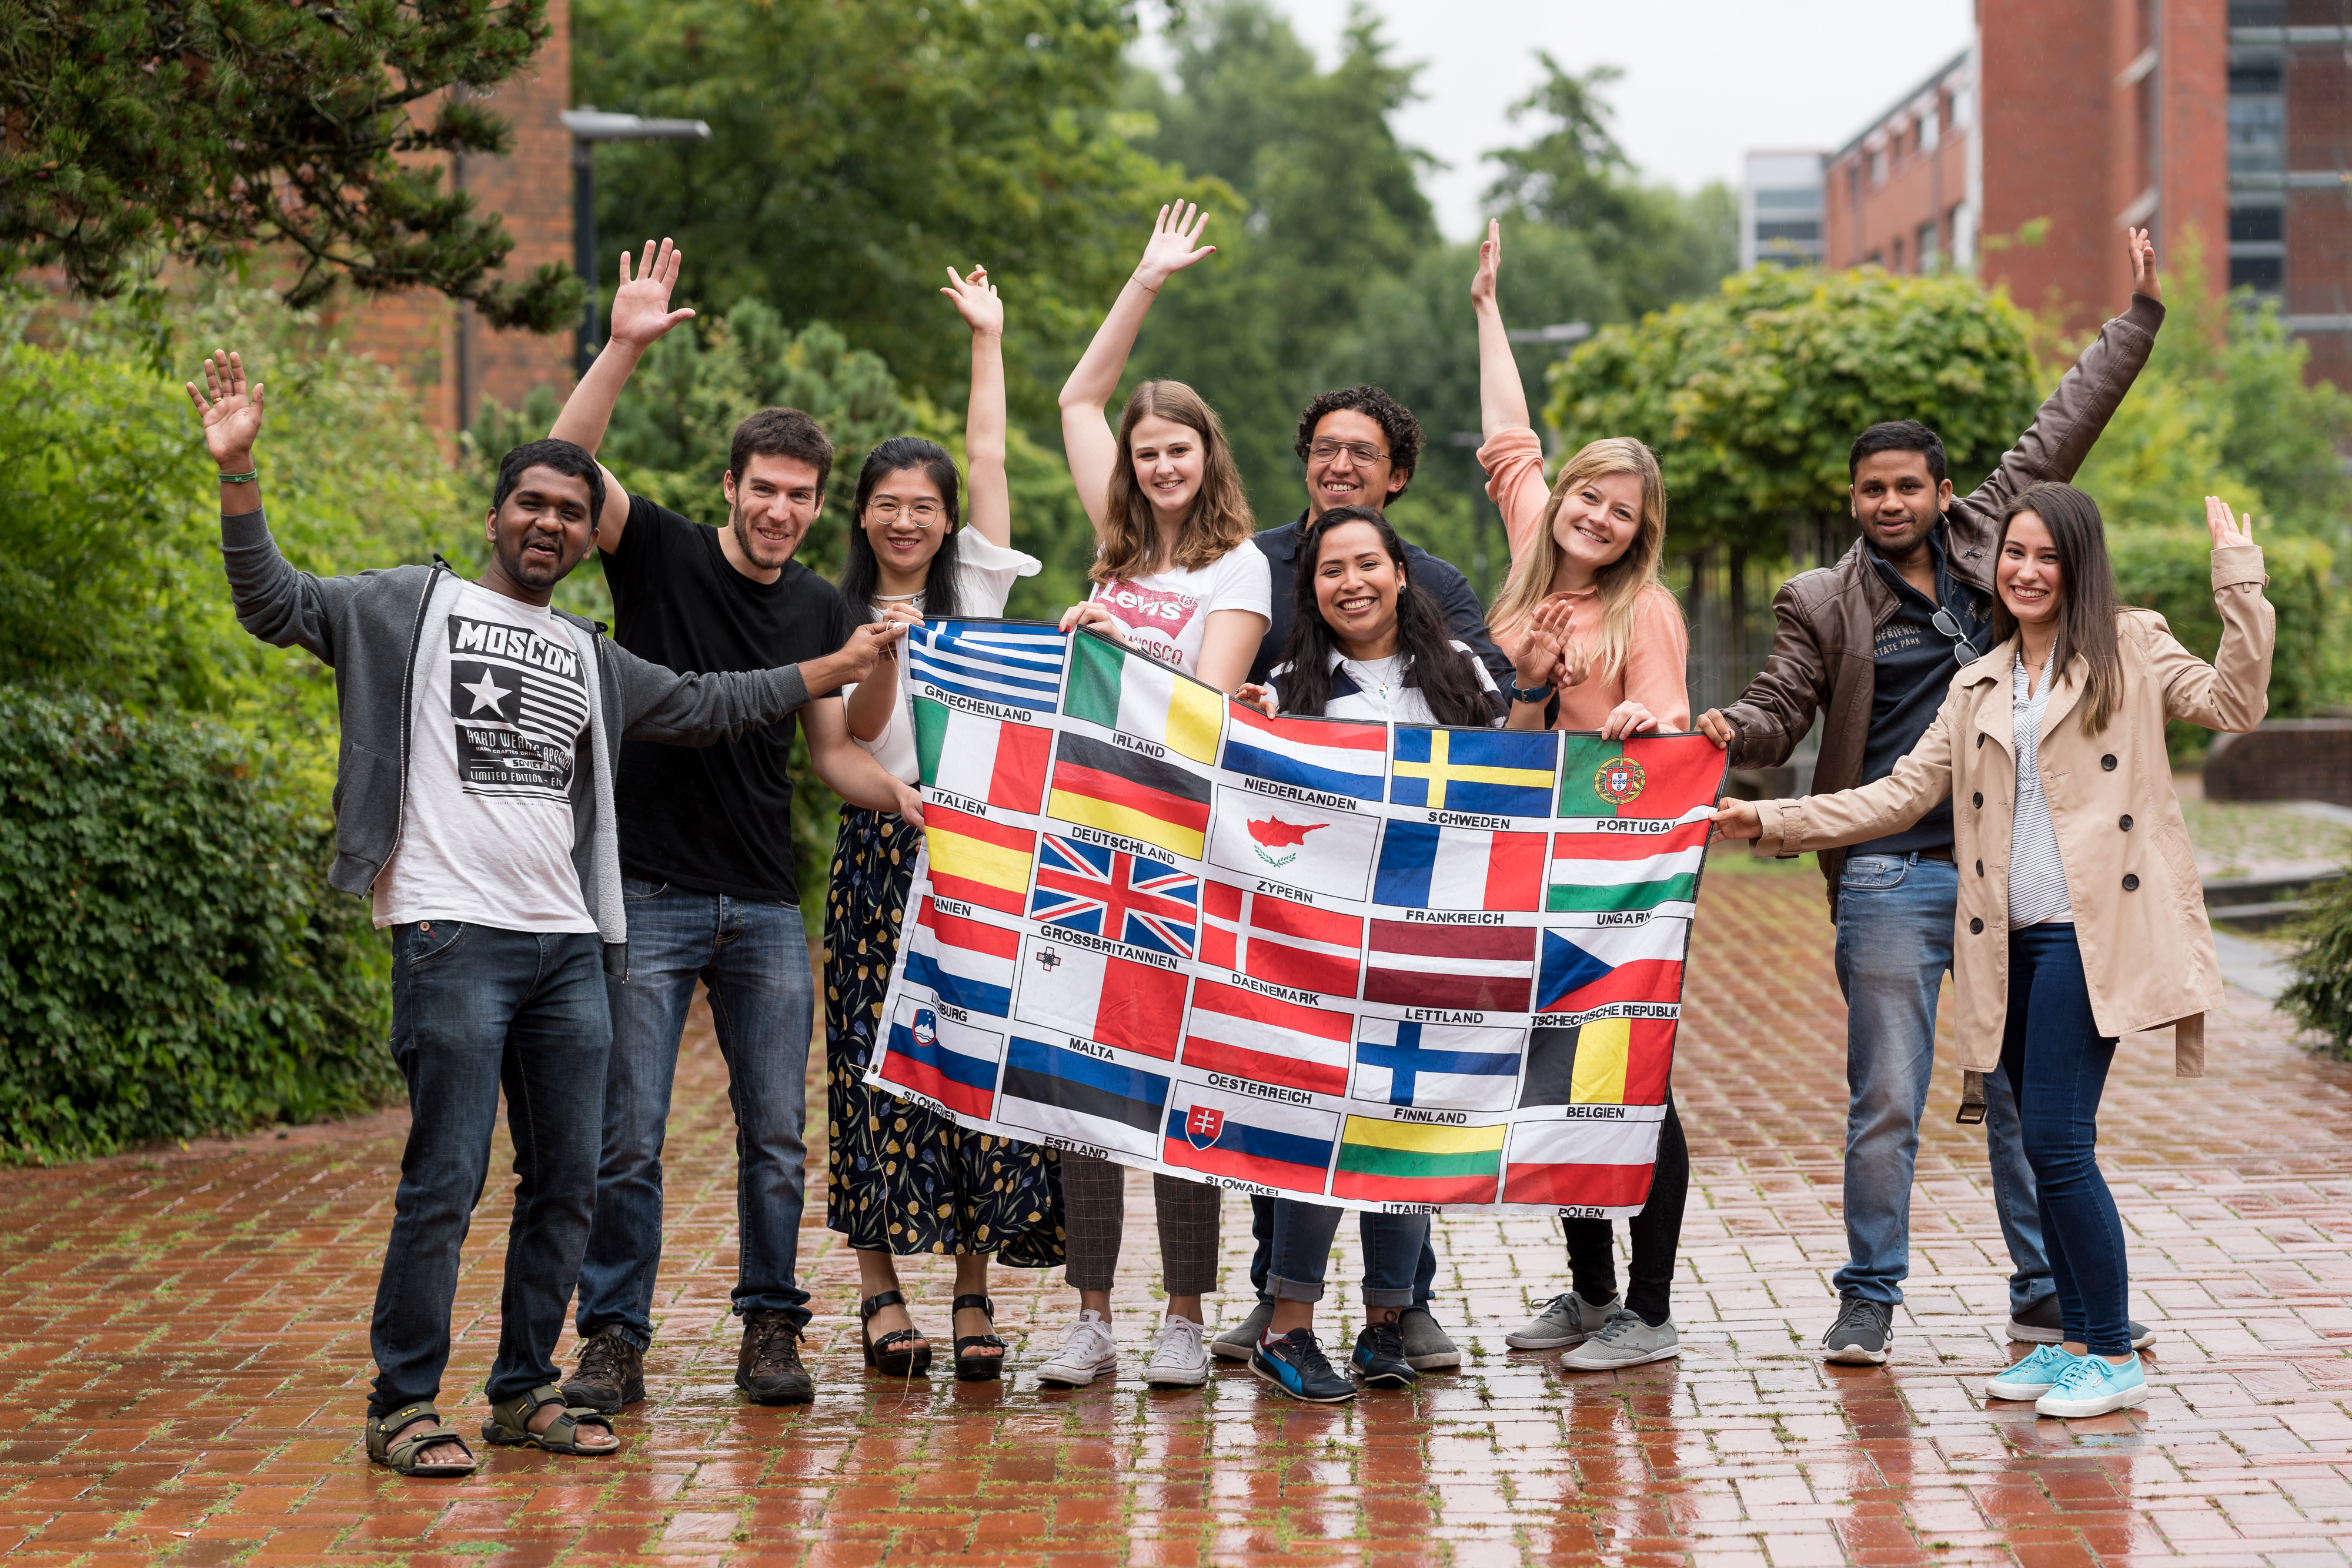 HS-Emden-International-07.jpg – Hochschule Emden/Leer